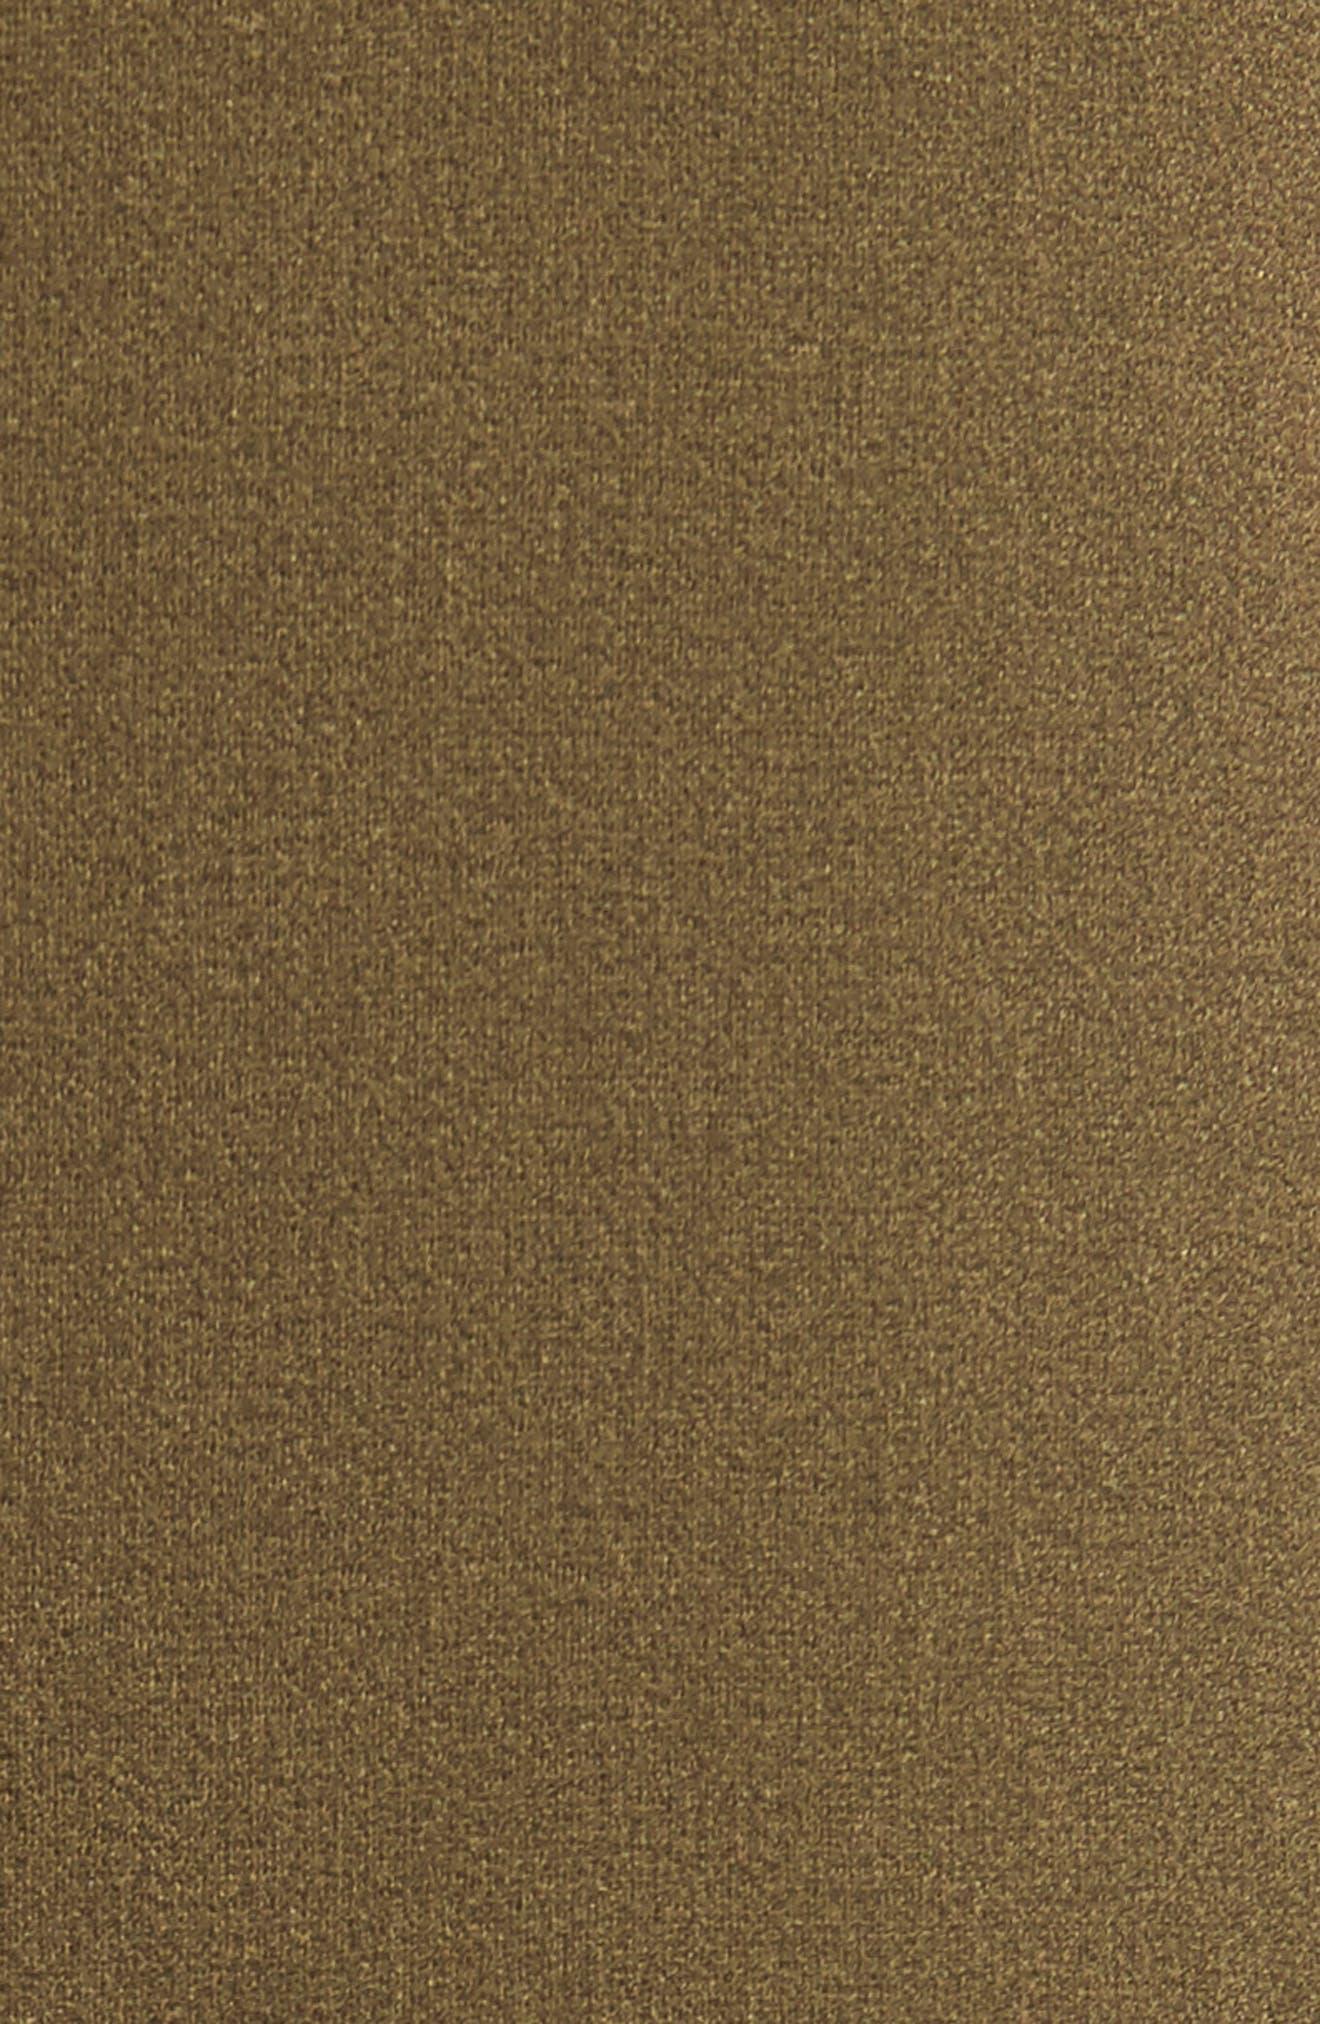 Hailey Crepe Dress,                             Alternate thumbnail 143, color,